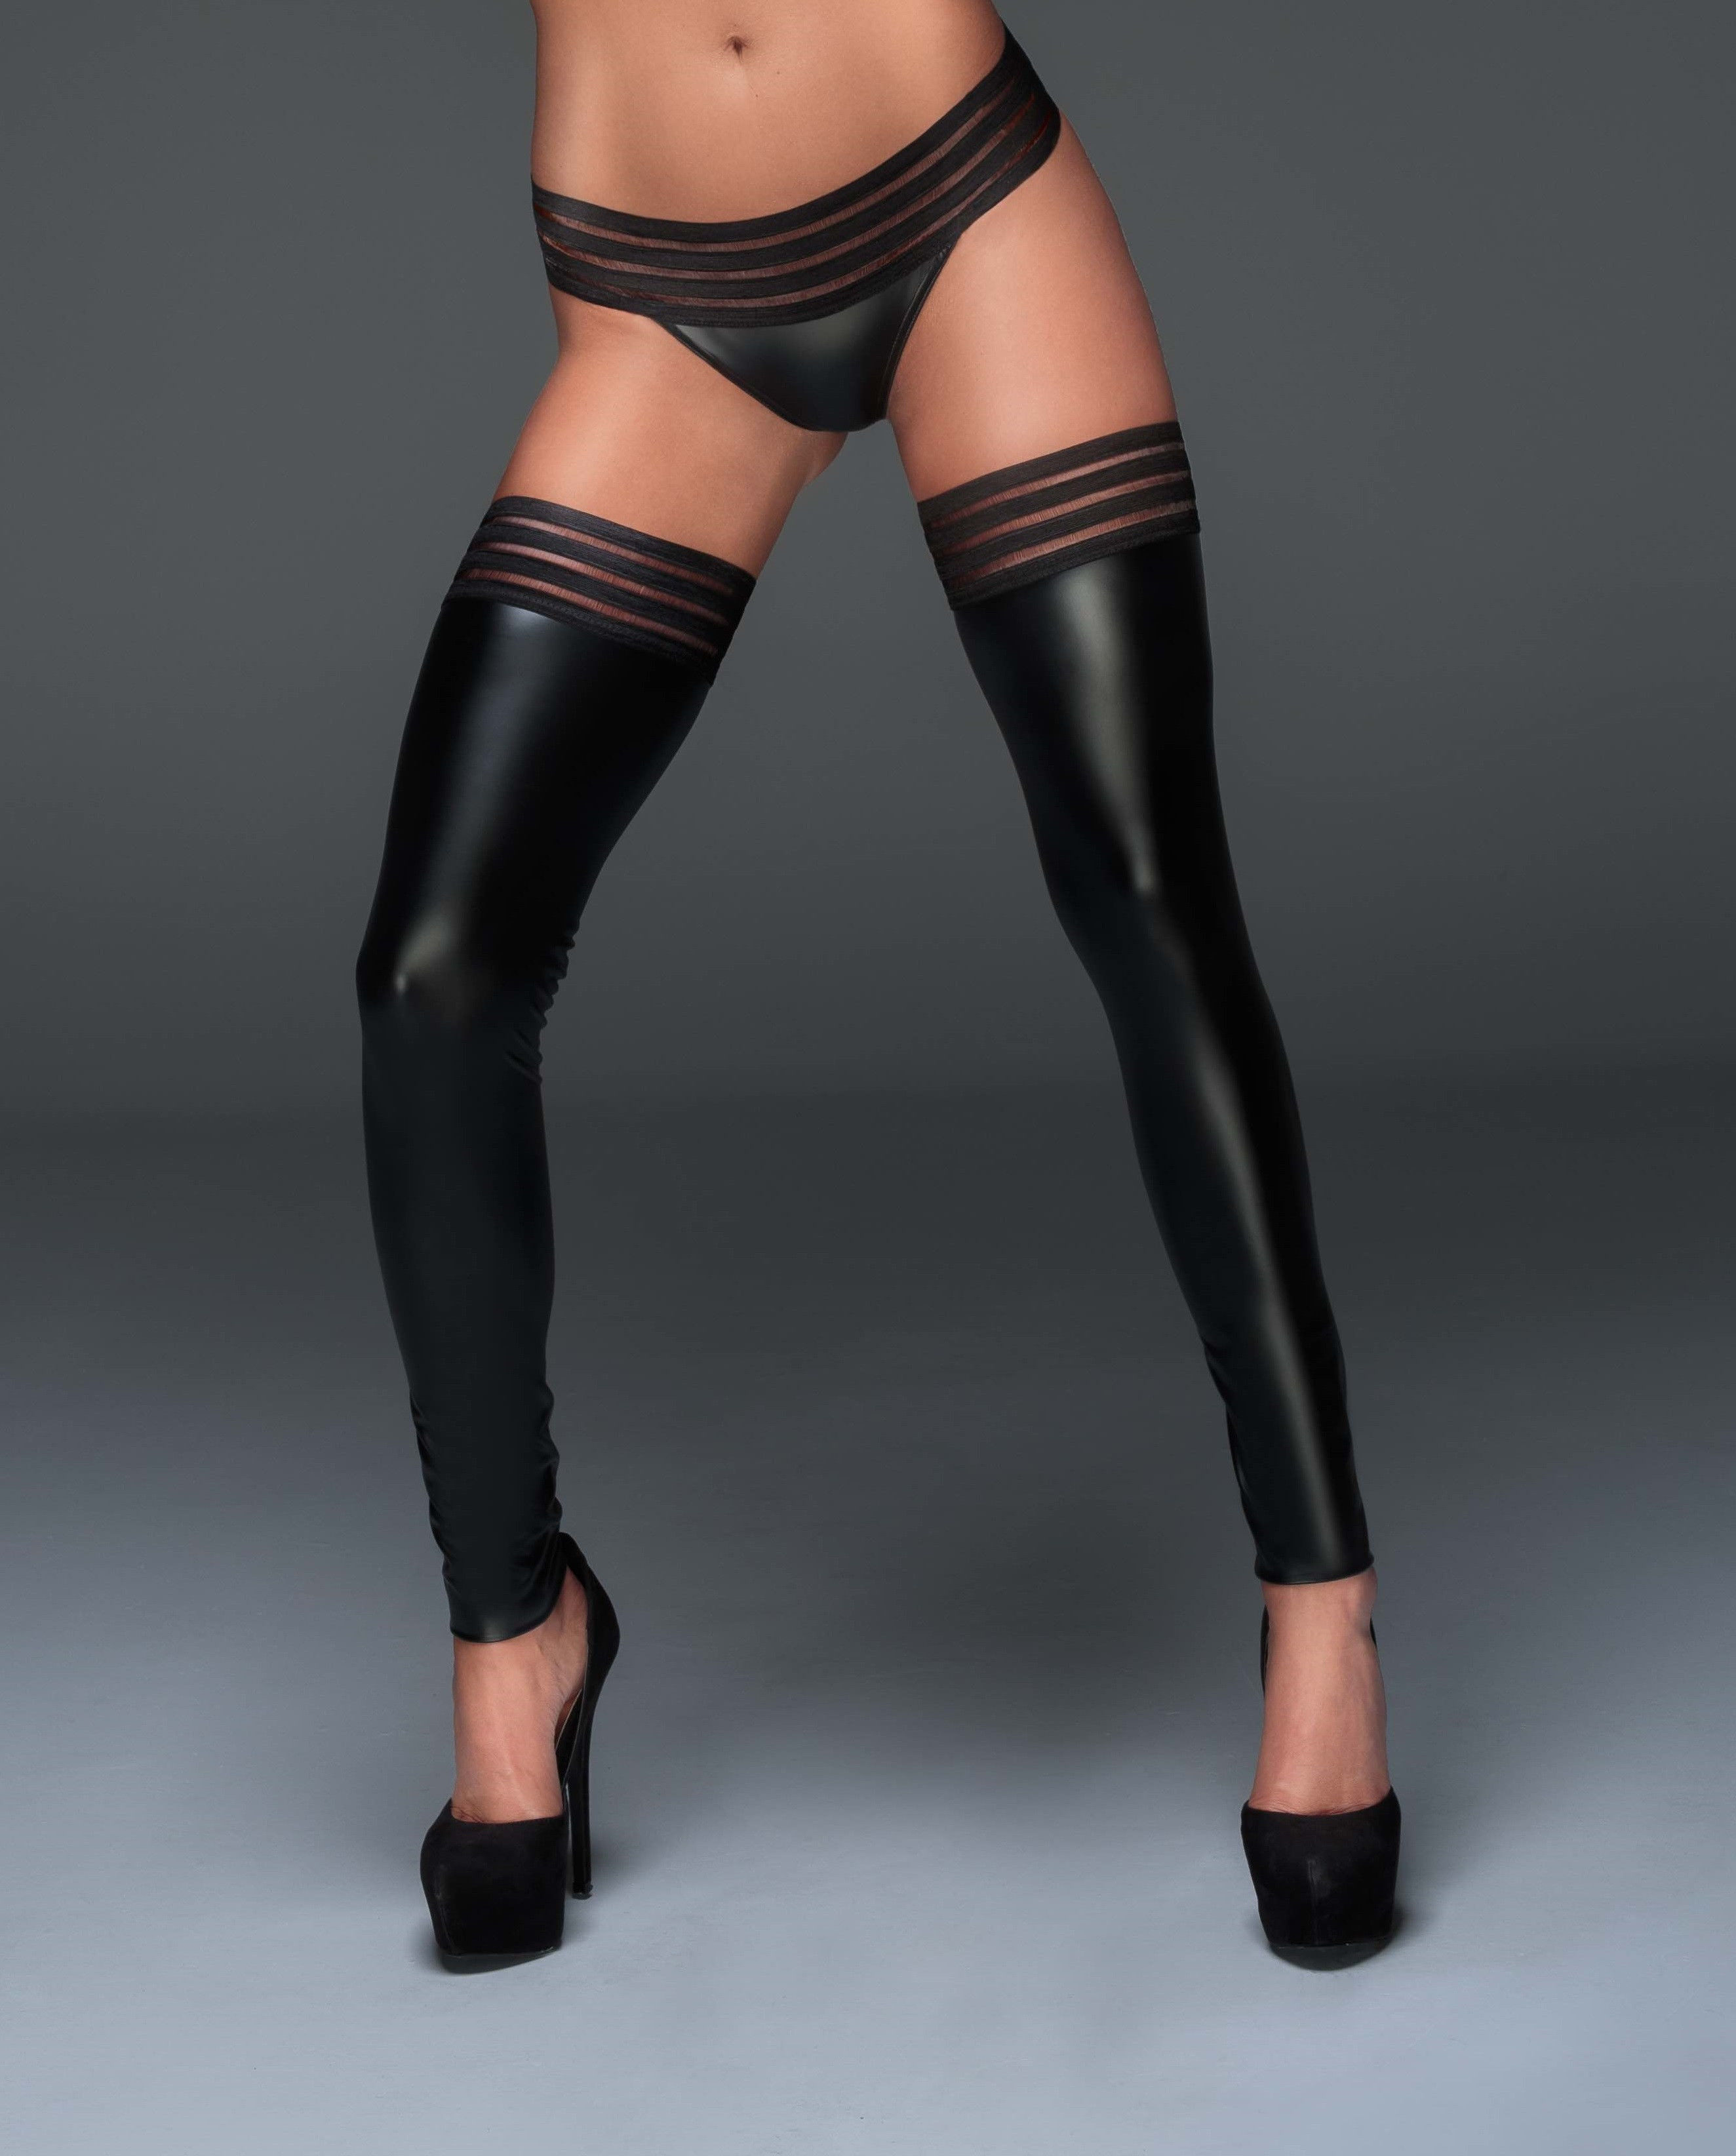 Noir Handmade F161 Powerwetlook Panty with Elastic Tape S